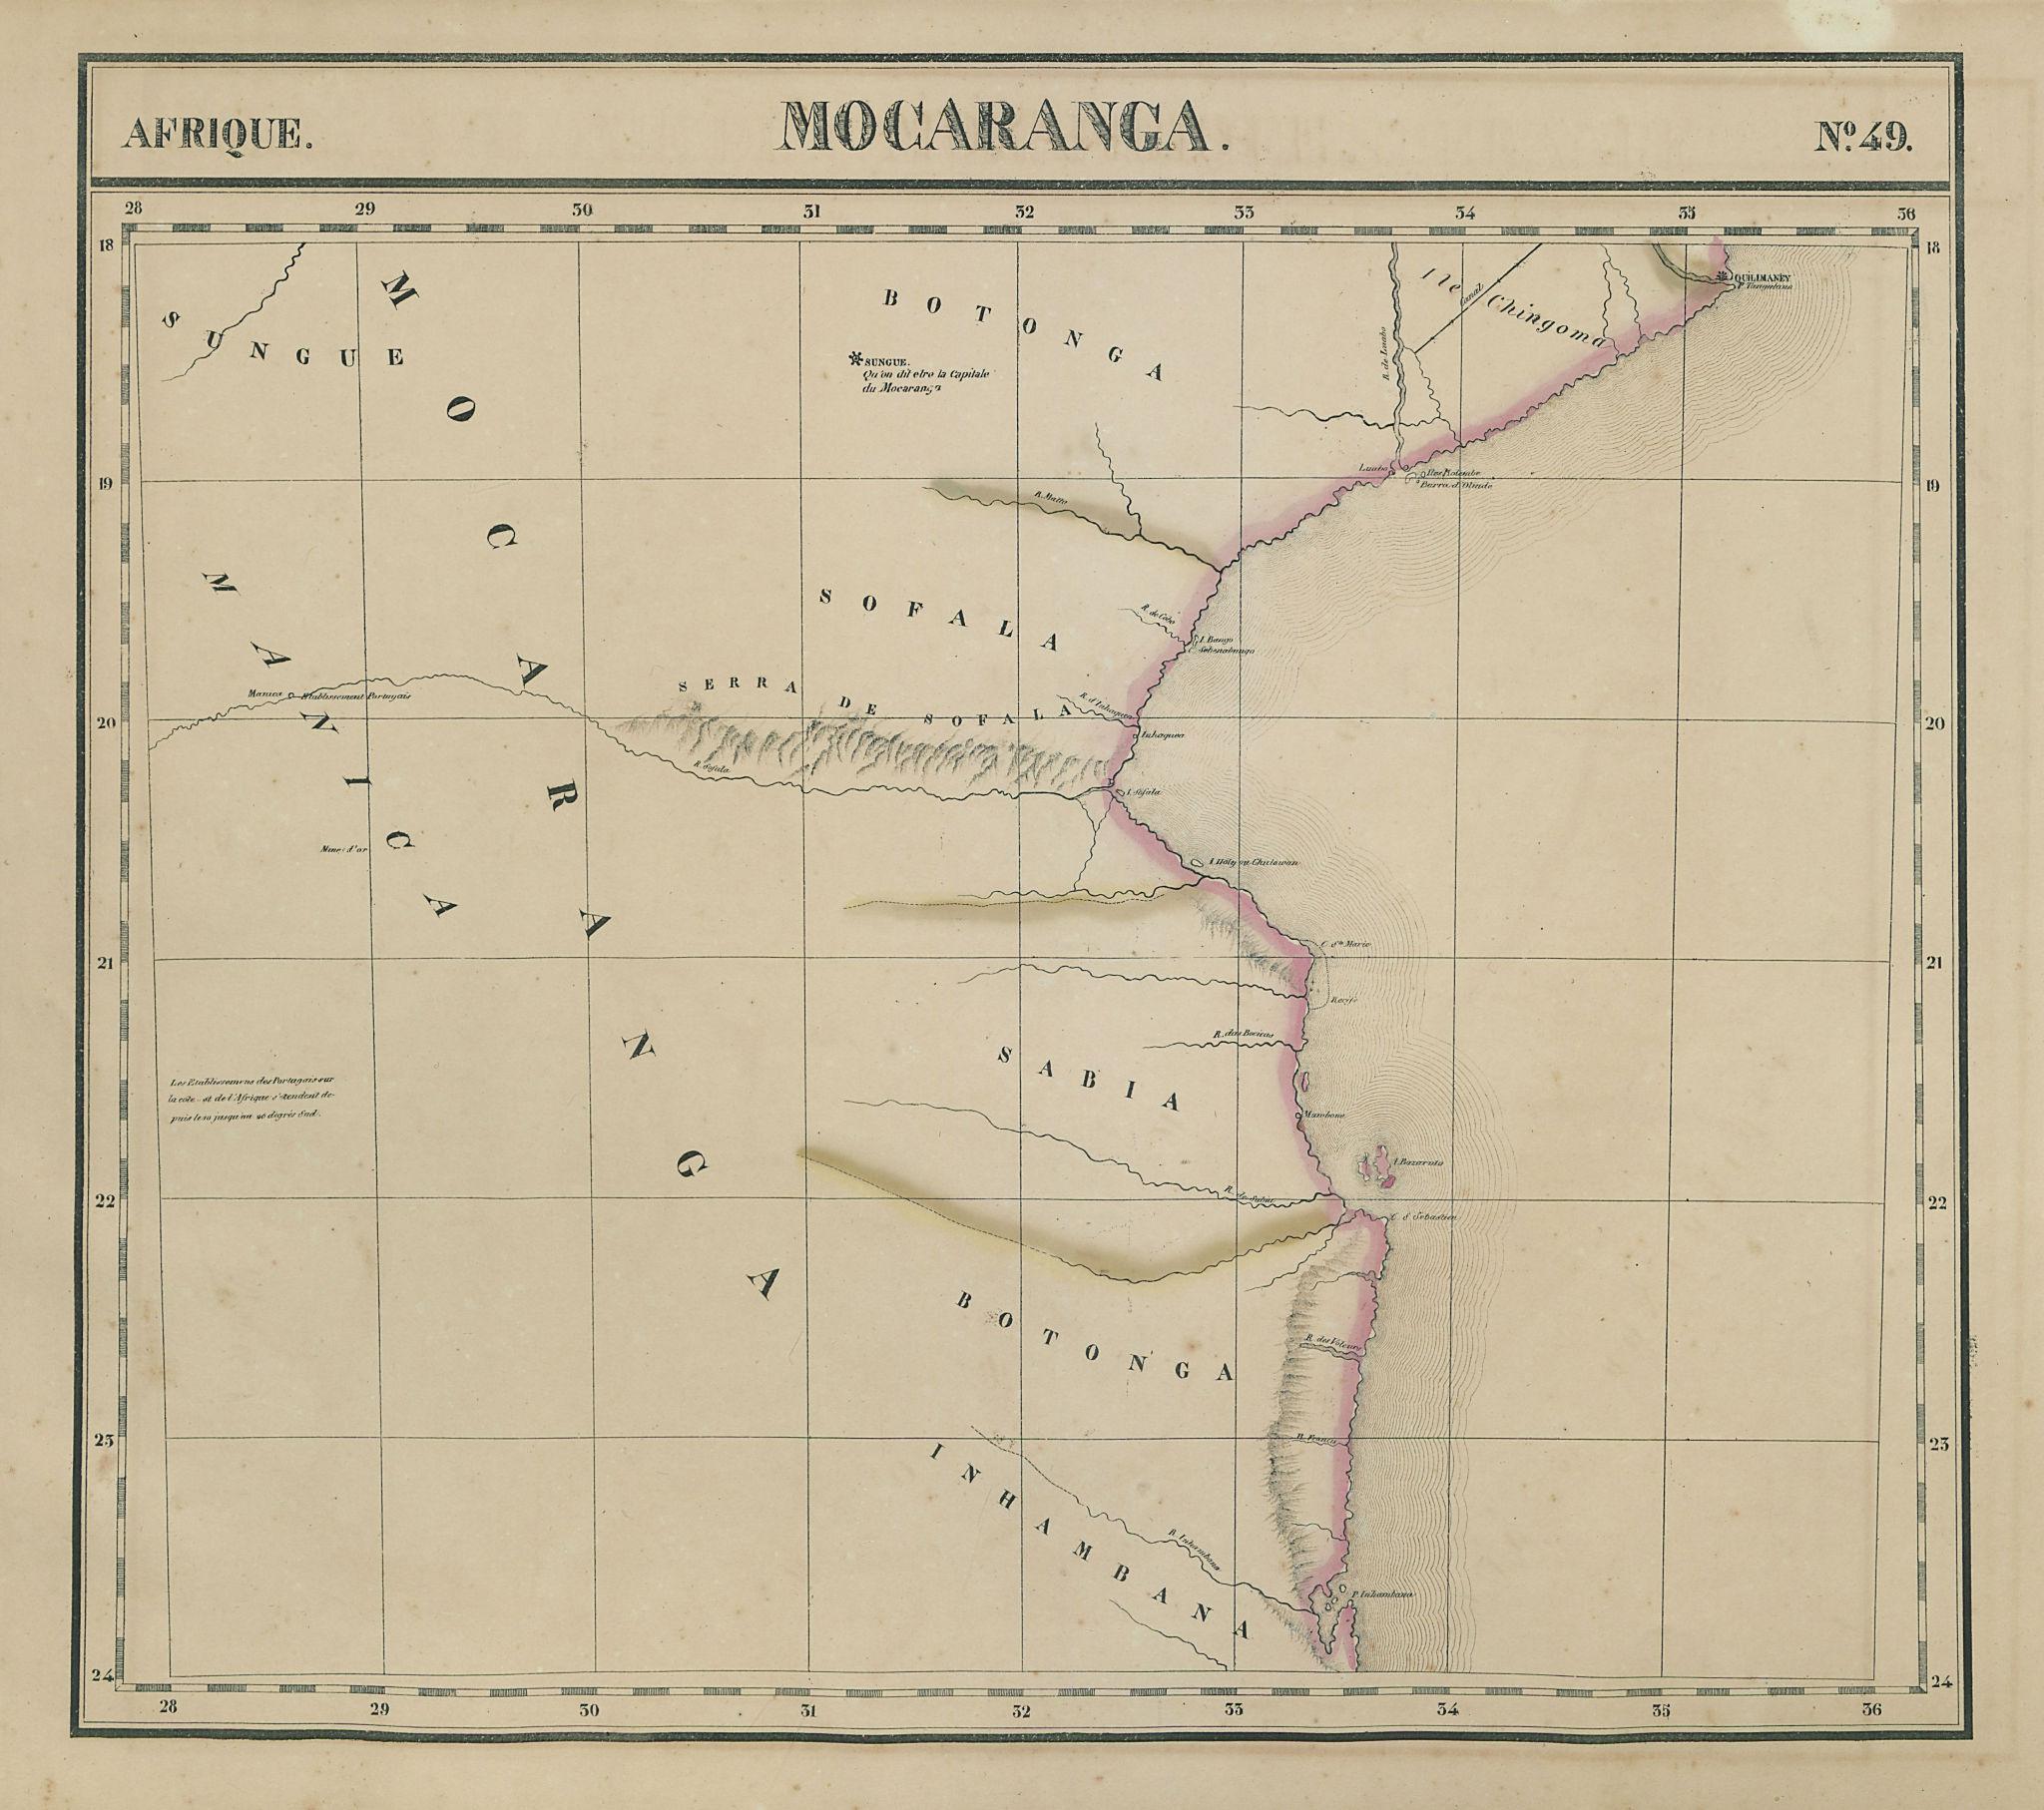 Afrique. Mocaranga #49 Southern Mozambique coast. Bazaruto VANDERMAELEN 1827 map